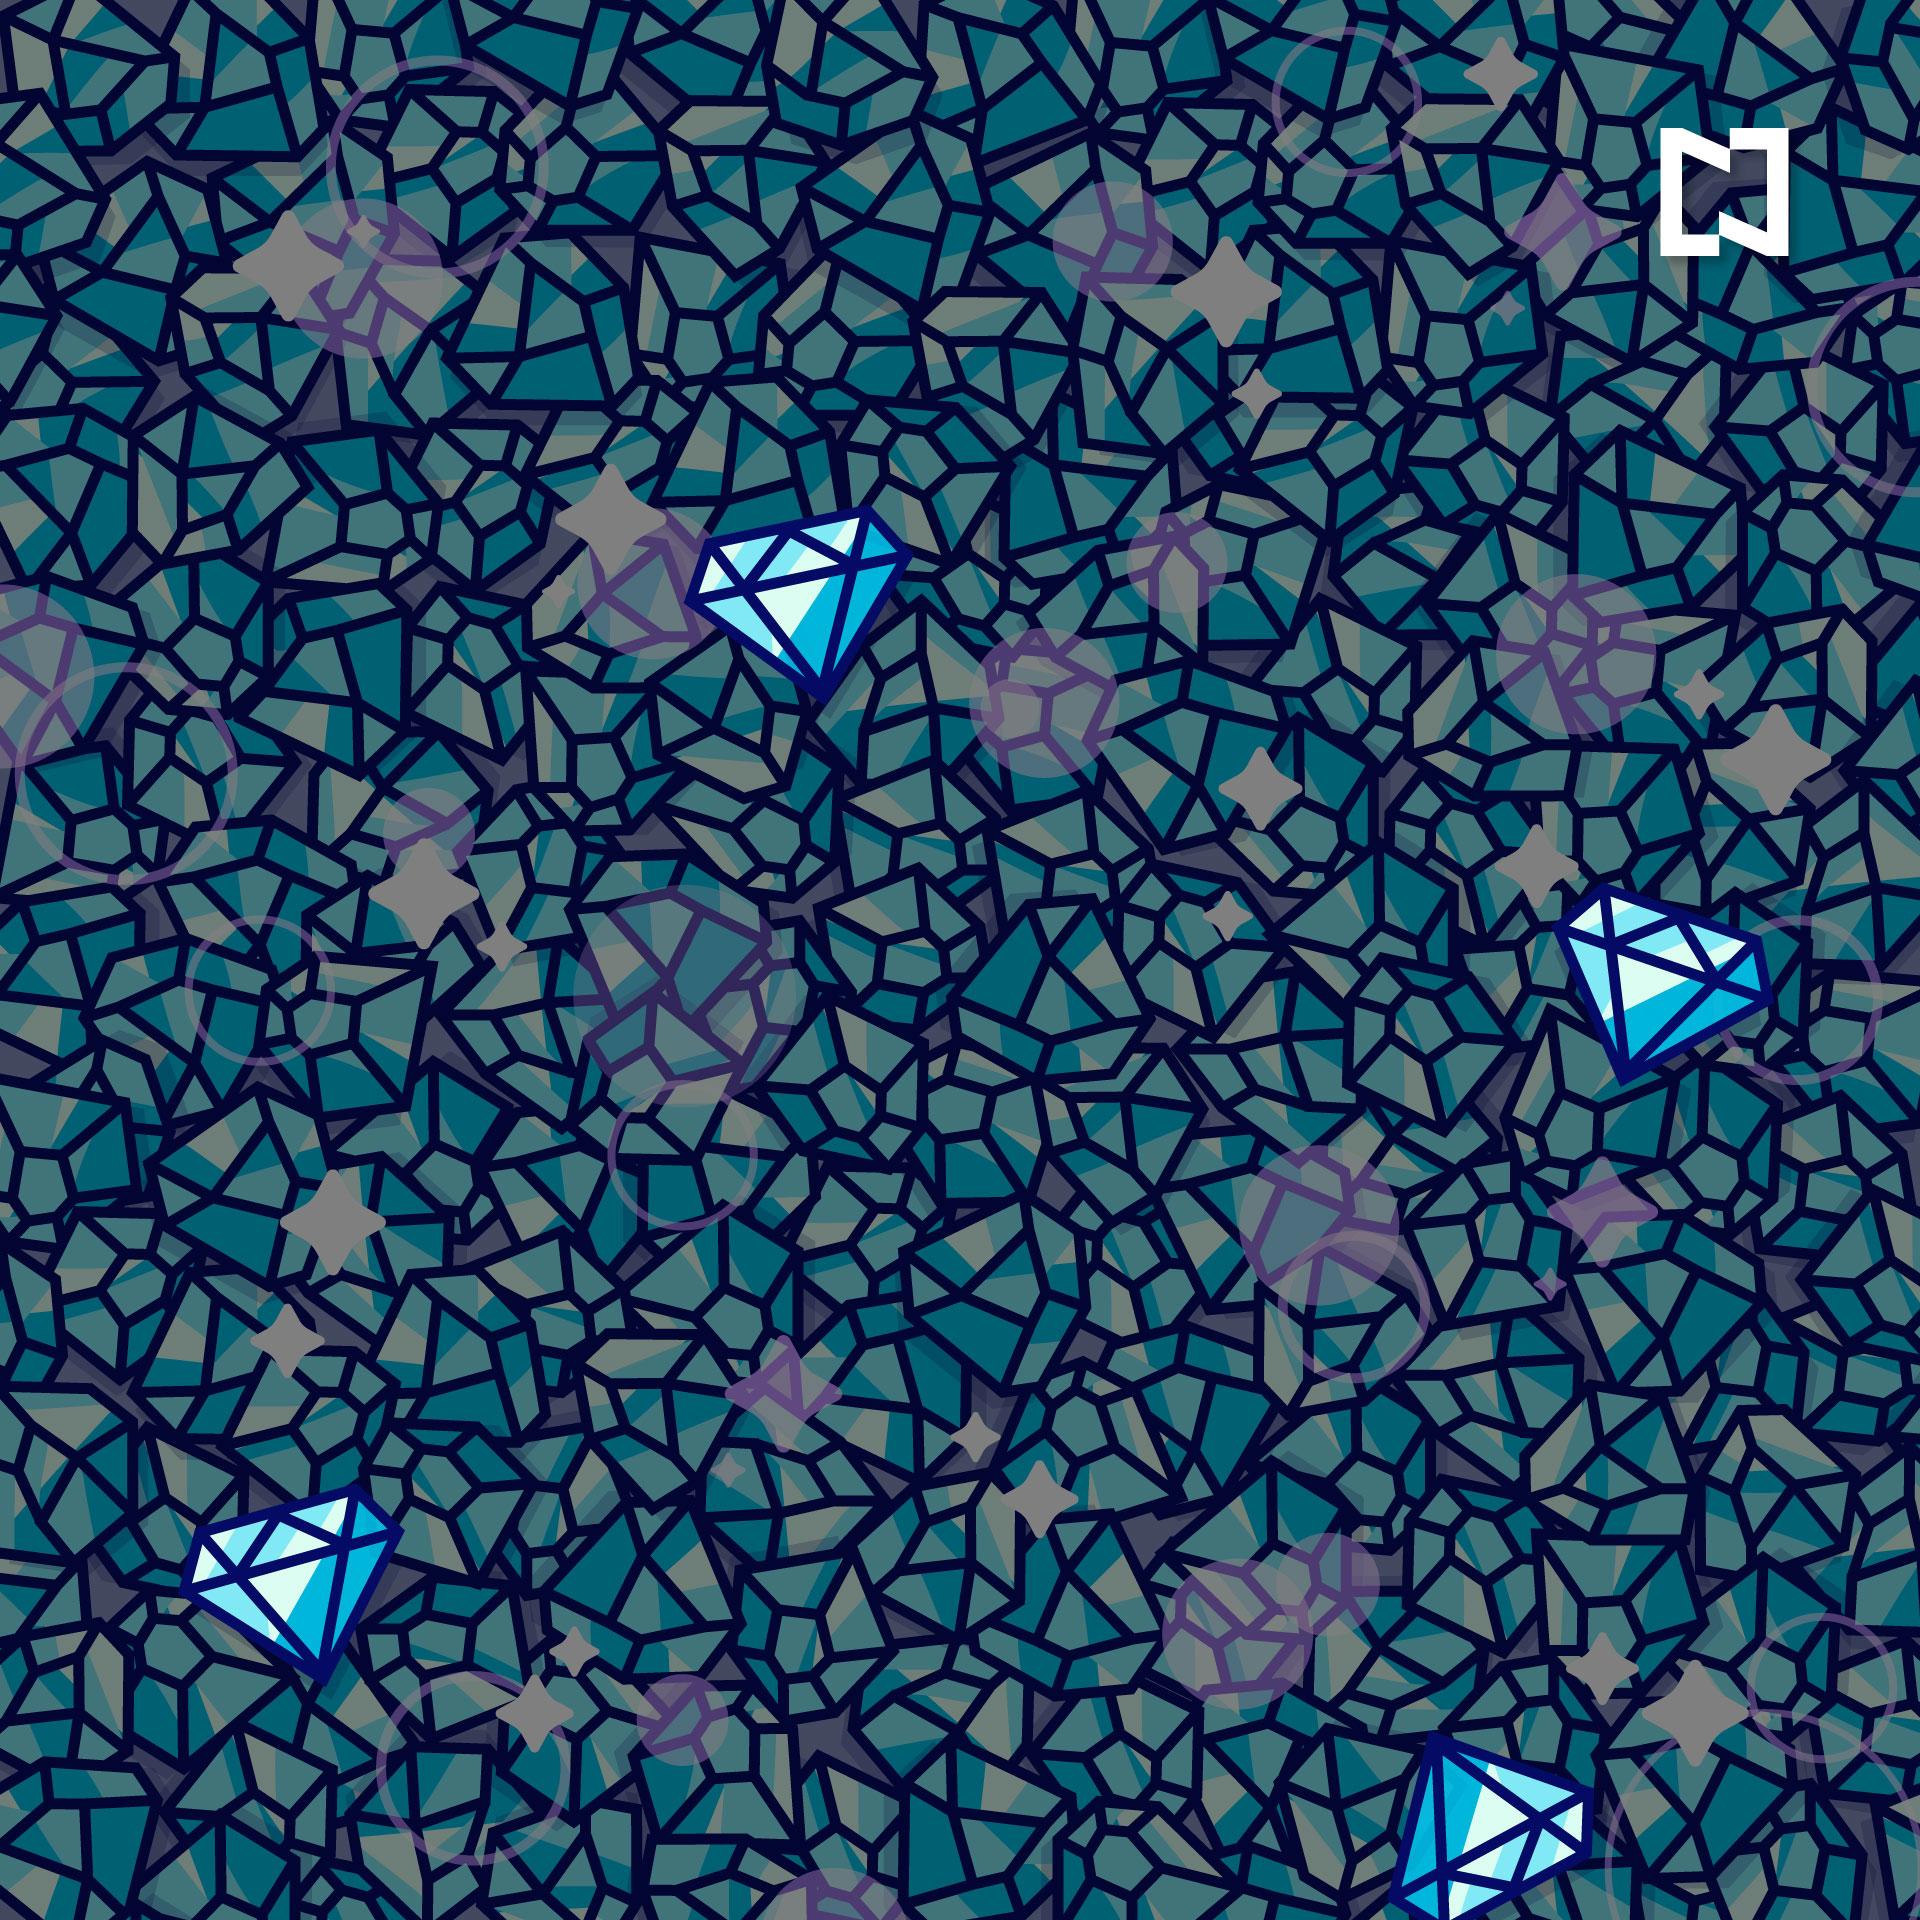 ilustracion lineas diamantes azules